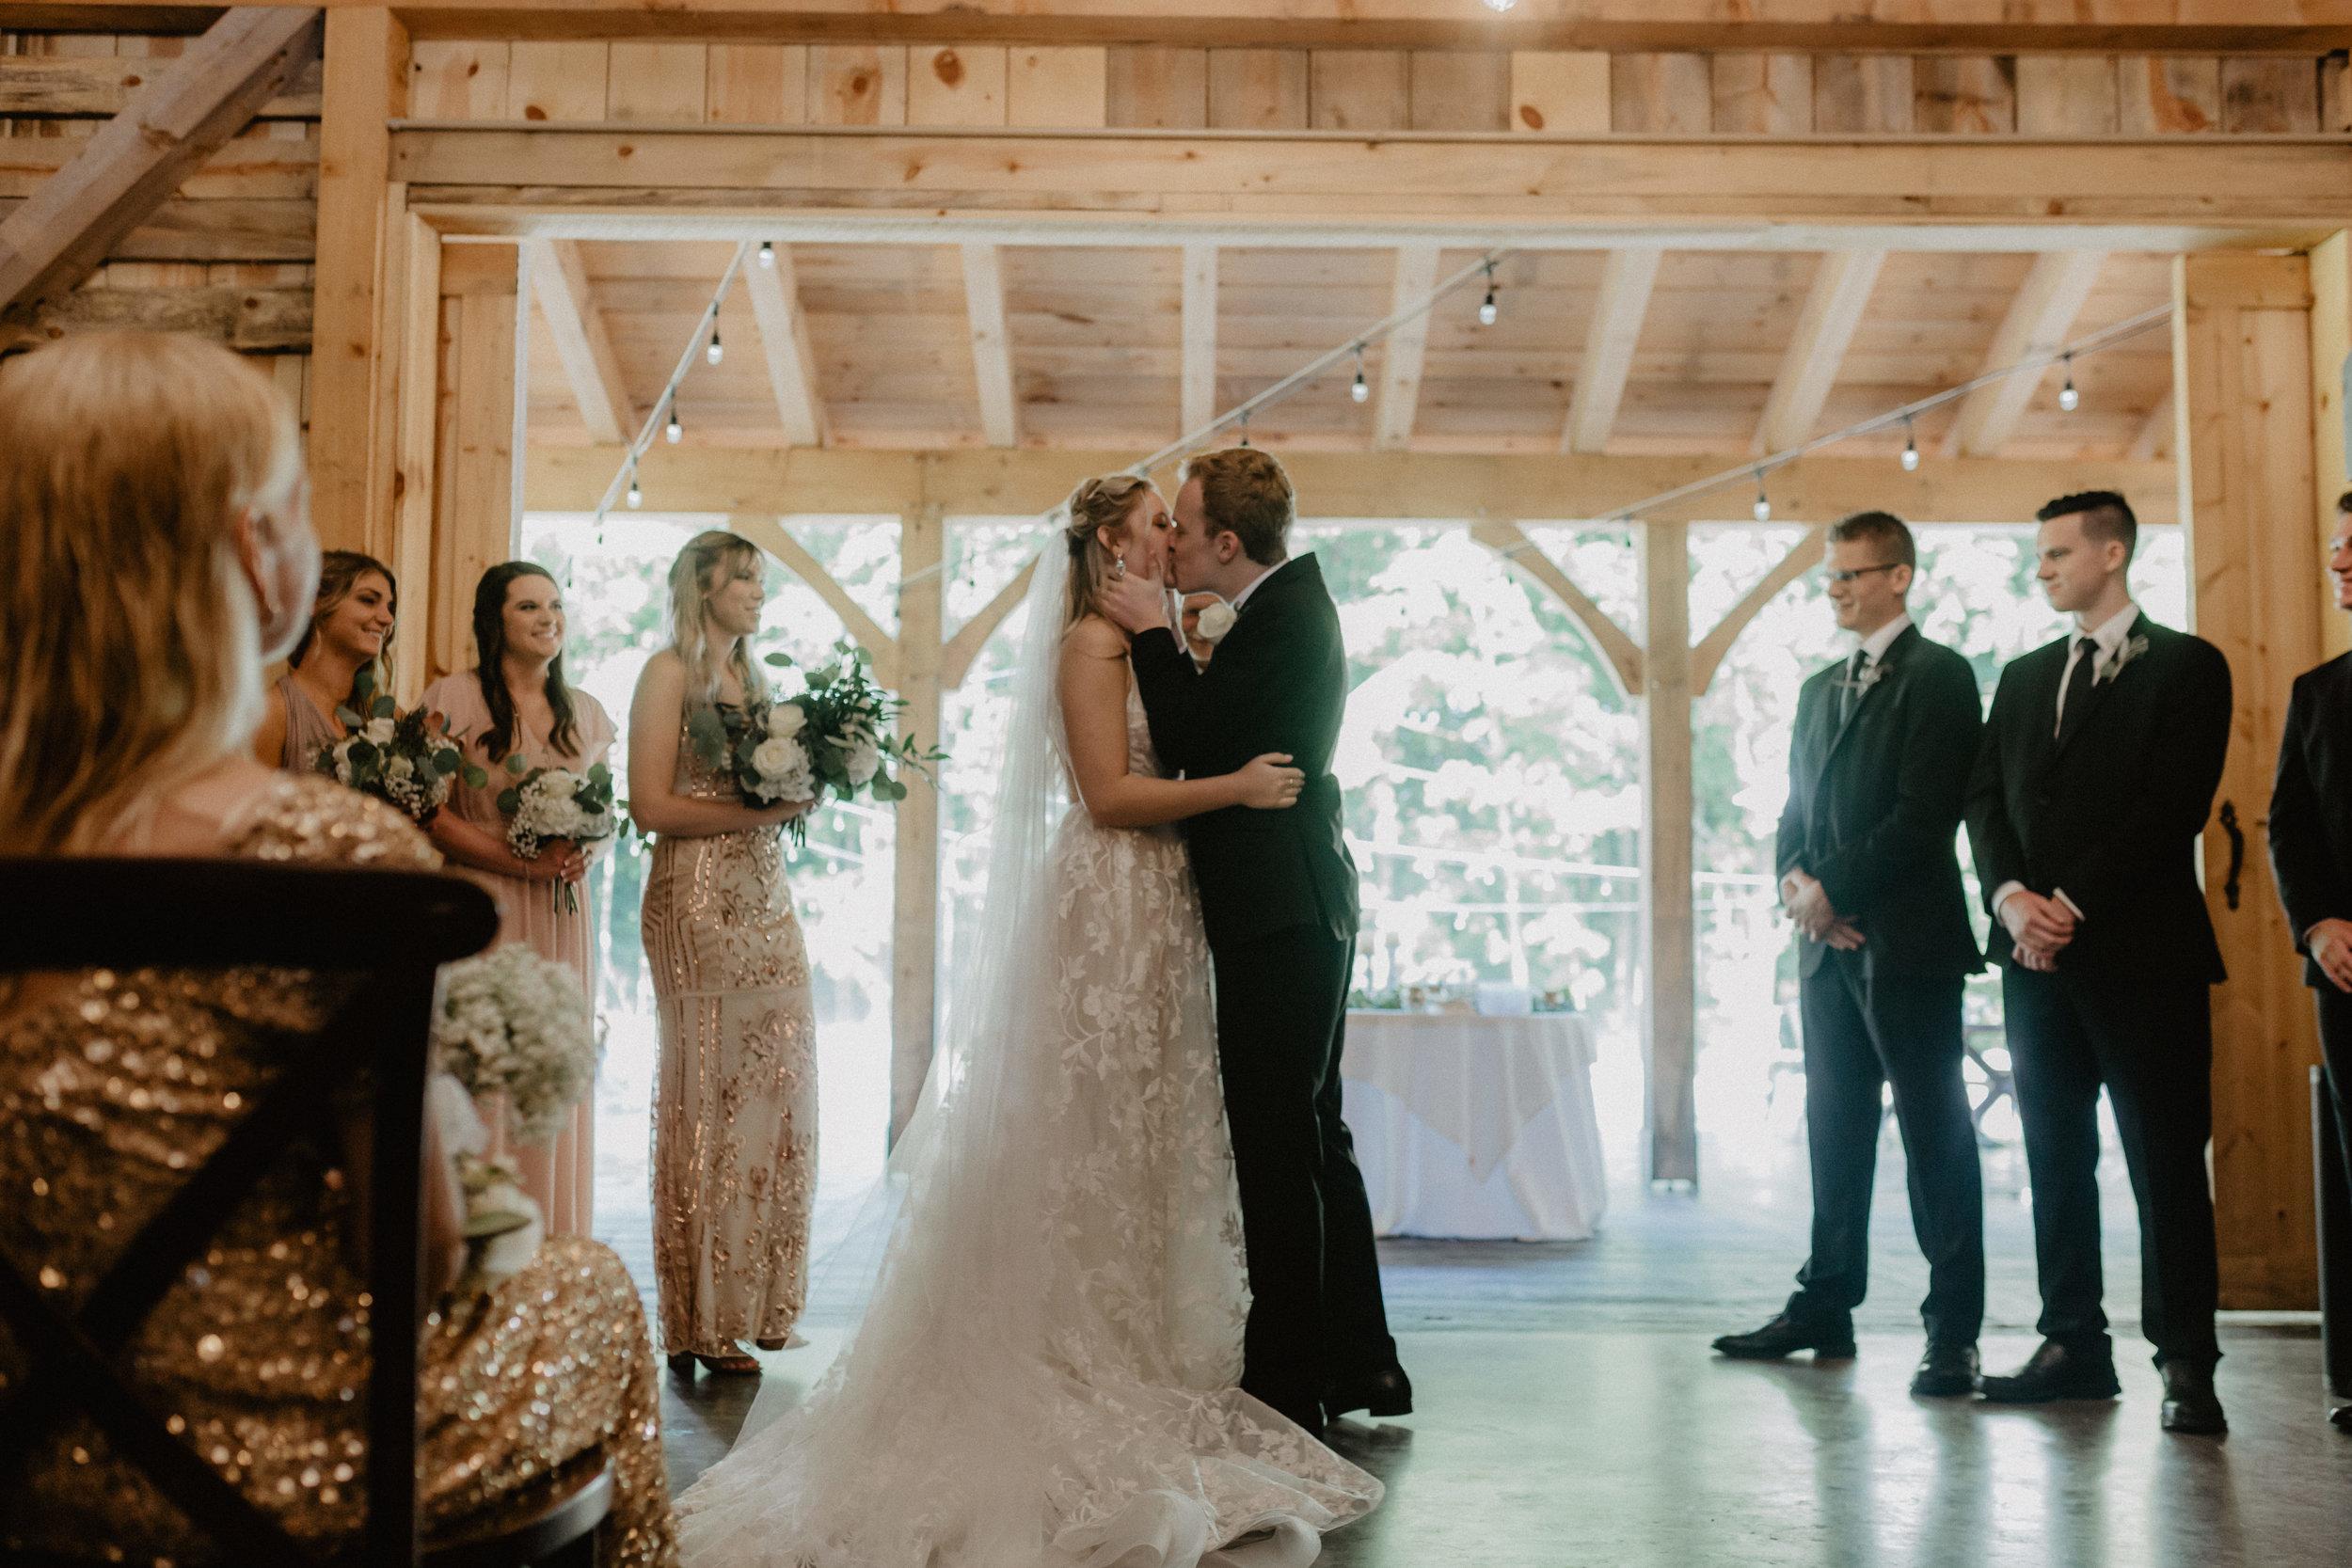 greywacke-meadows-wedding-42.jpg